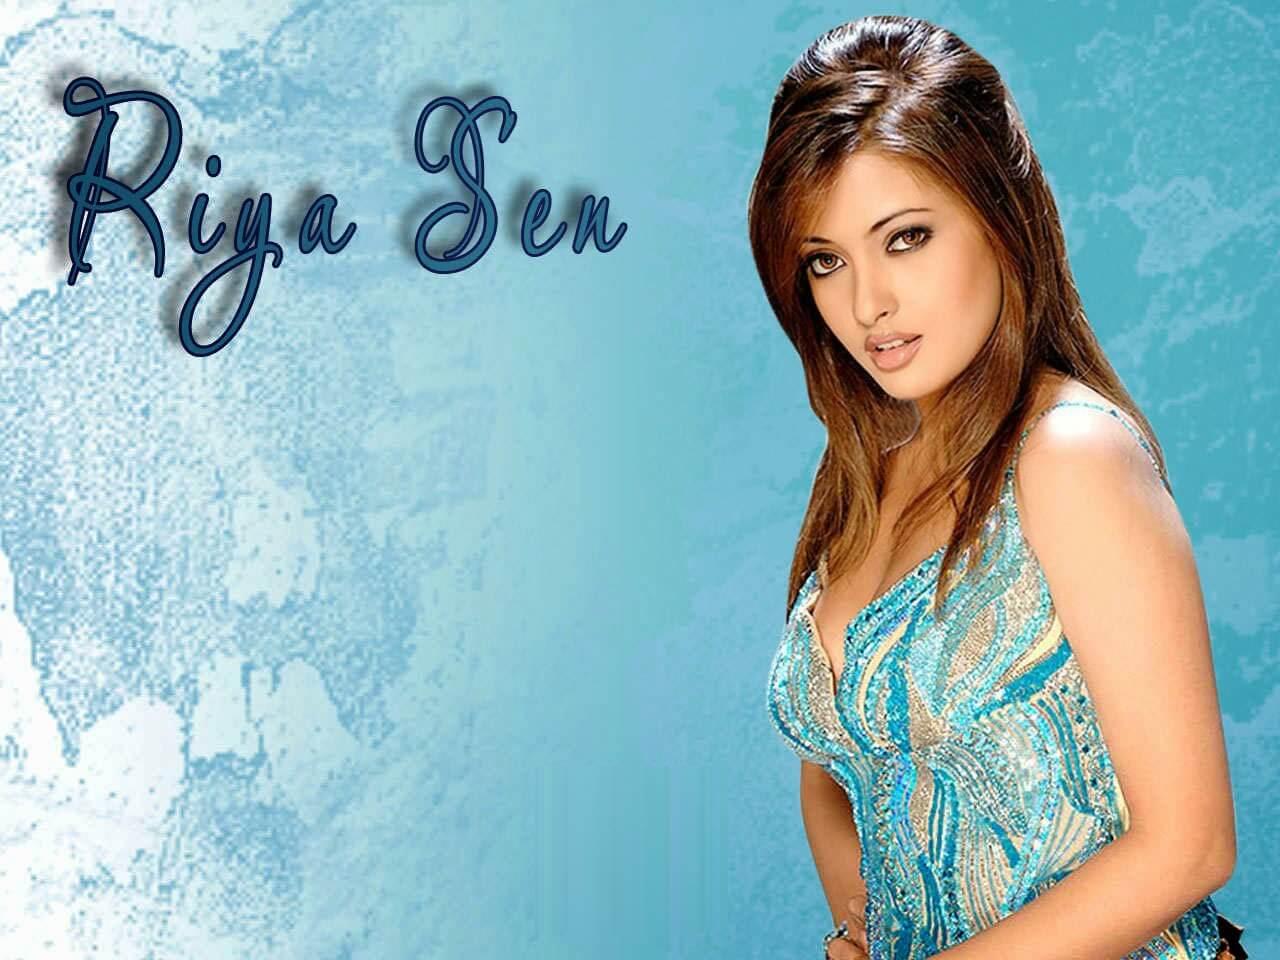 Riya Sen age, husband, height, marriage, image, family, birthday, bio, news, net worth, education, details, instagram, wiki, twitter, imdb, website, facebook